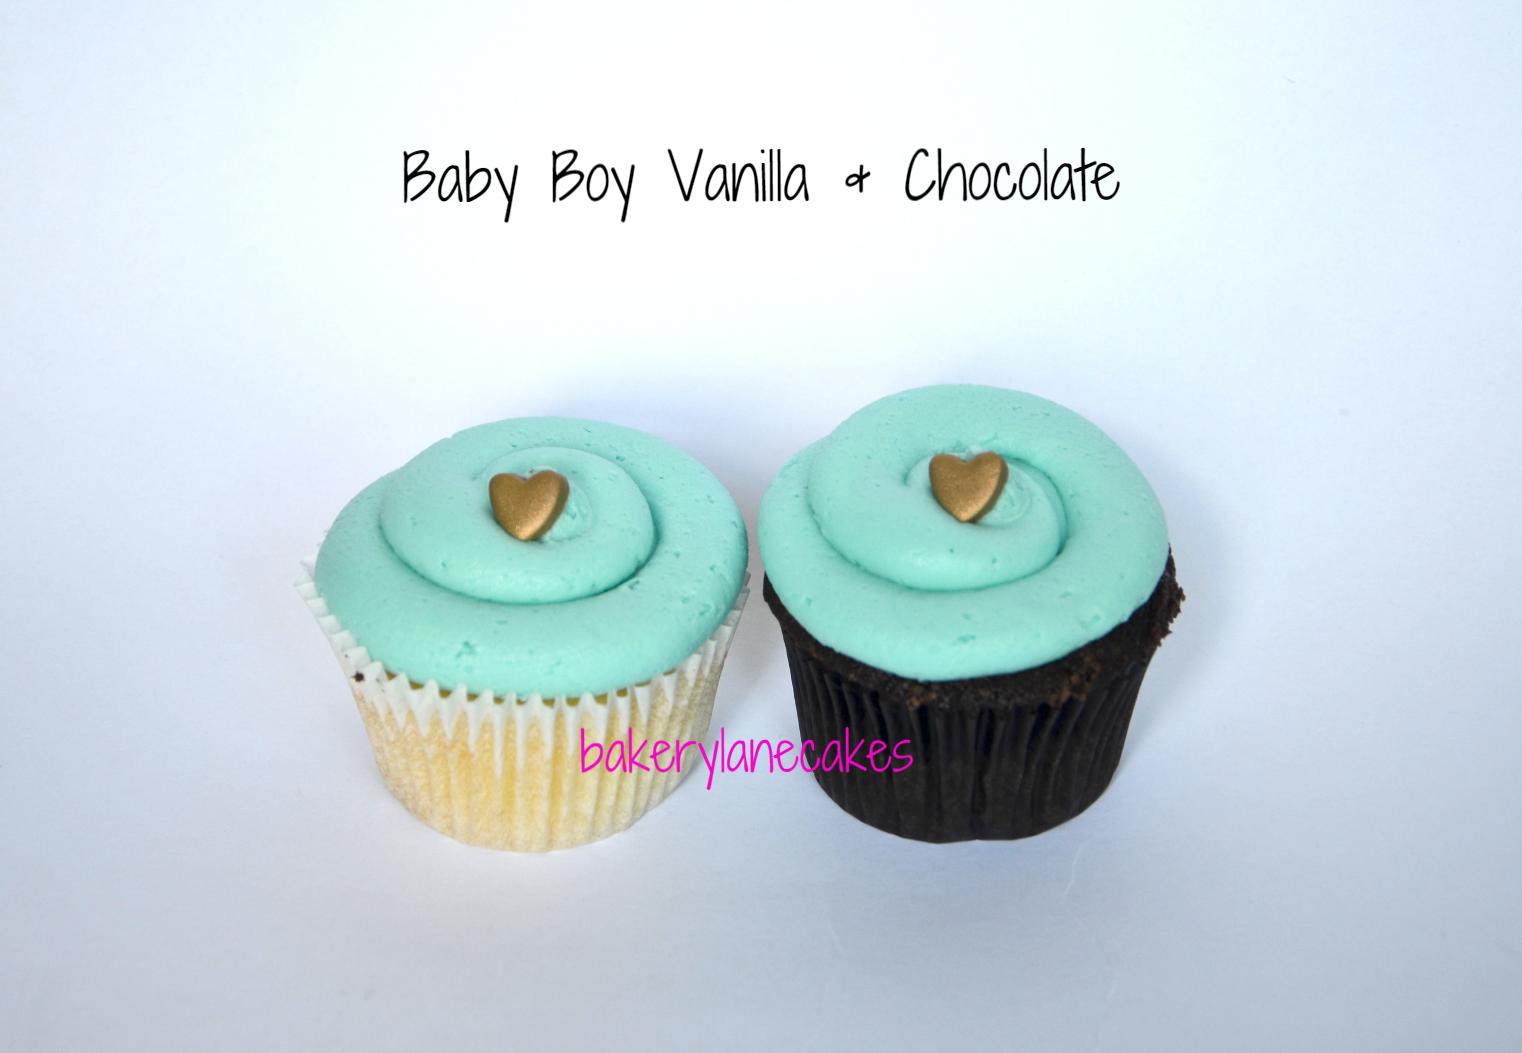 ~ Baby Boy Vanilla & Chocolate ~